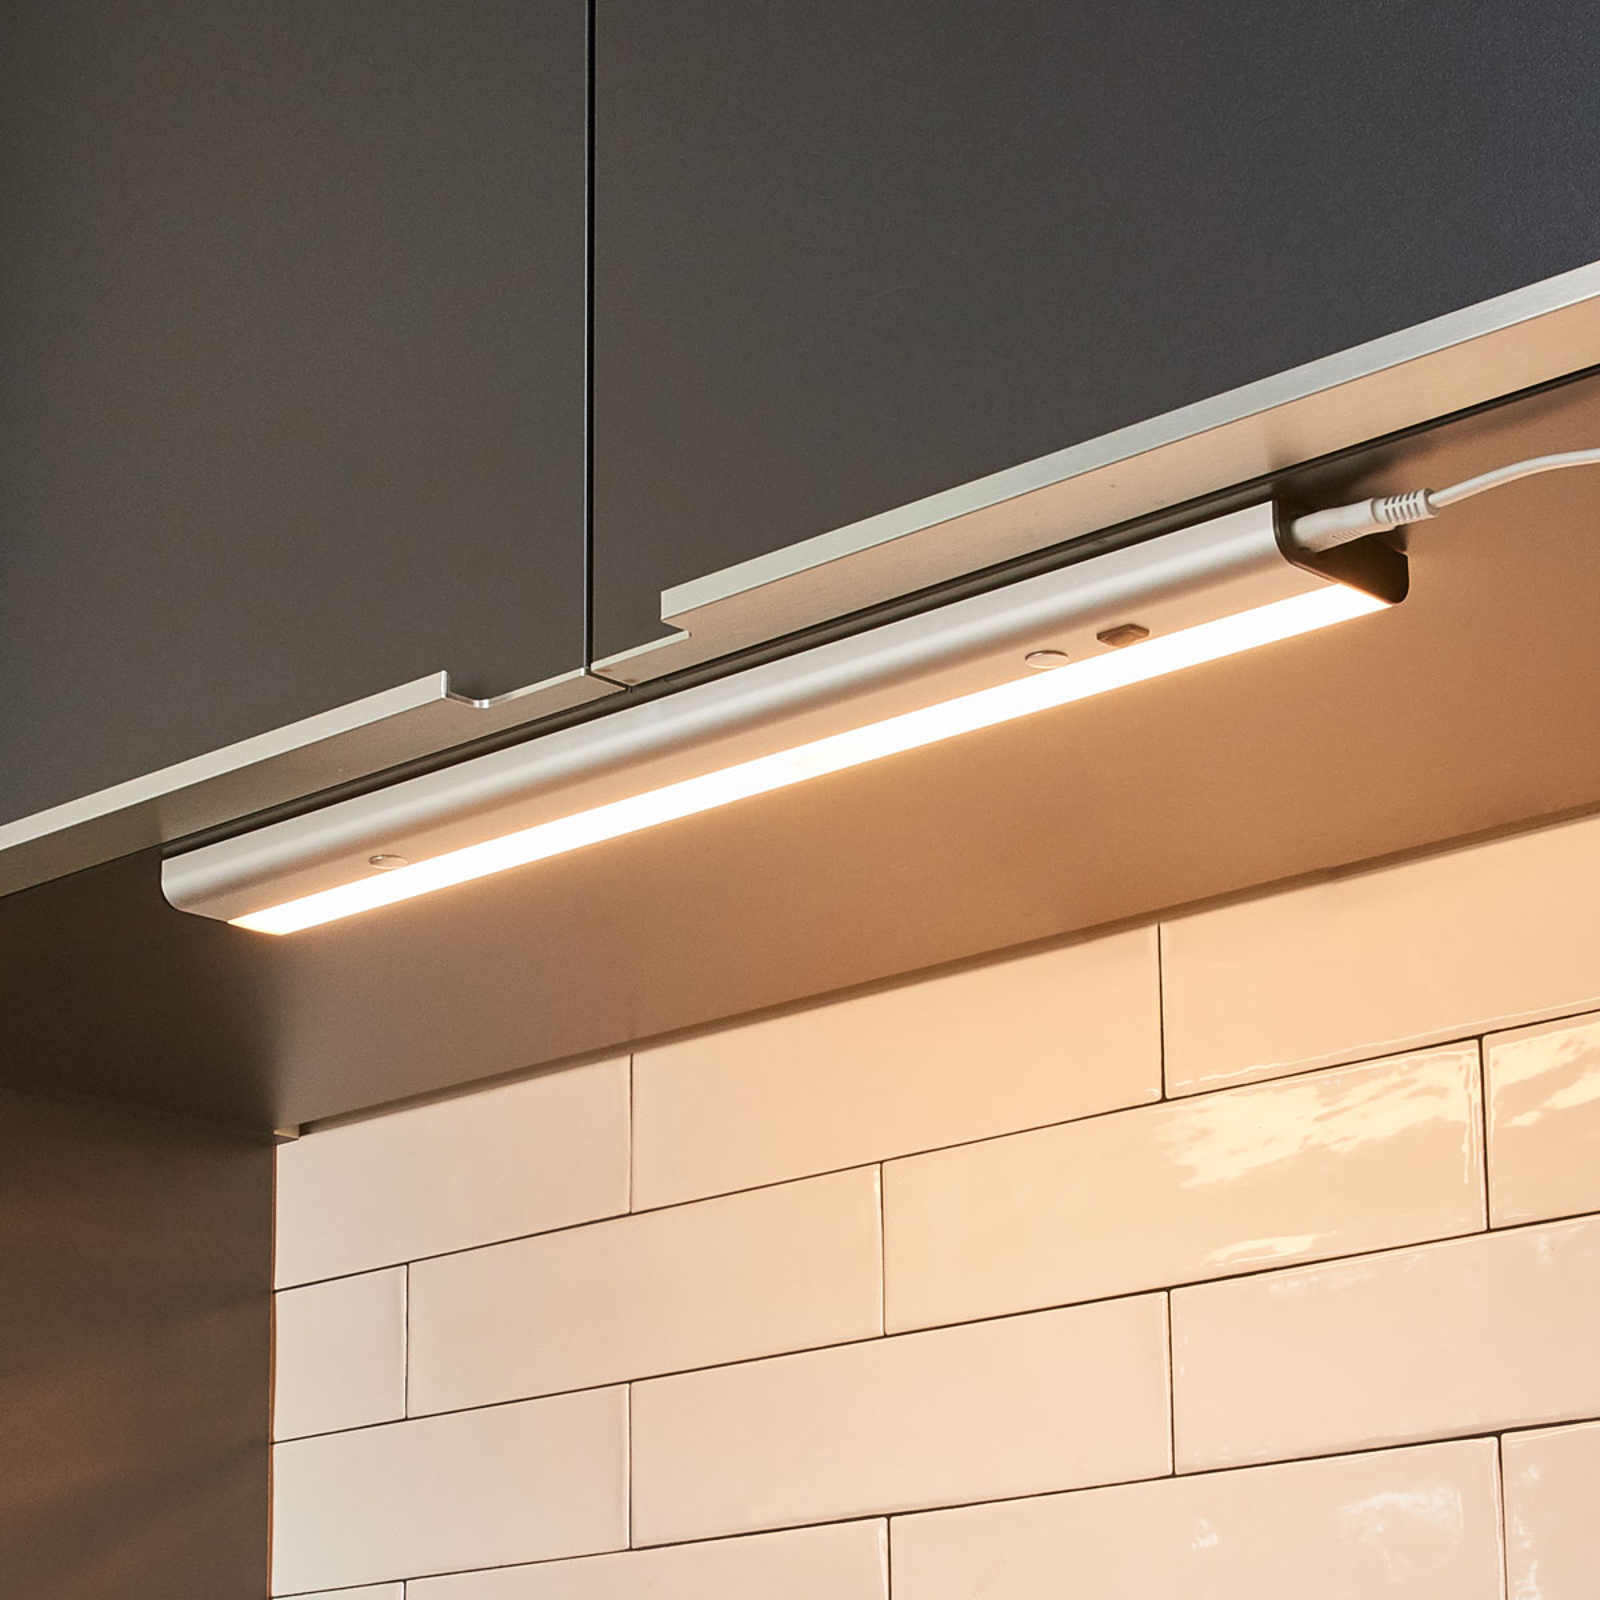 Devin - LED-underbyggnadslampa m. omkopplare